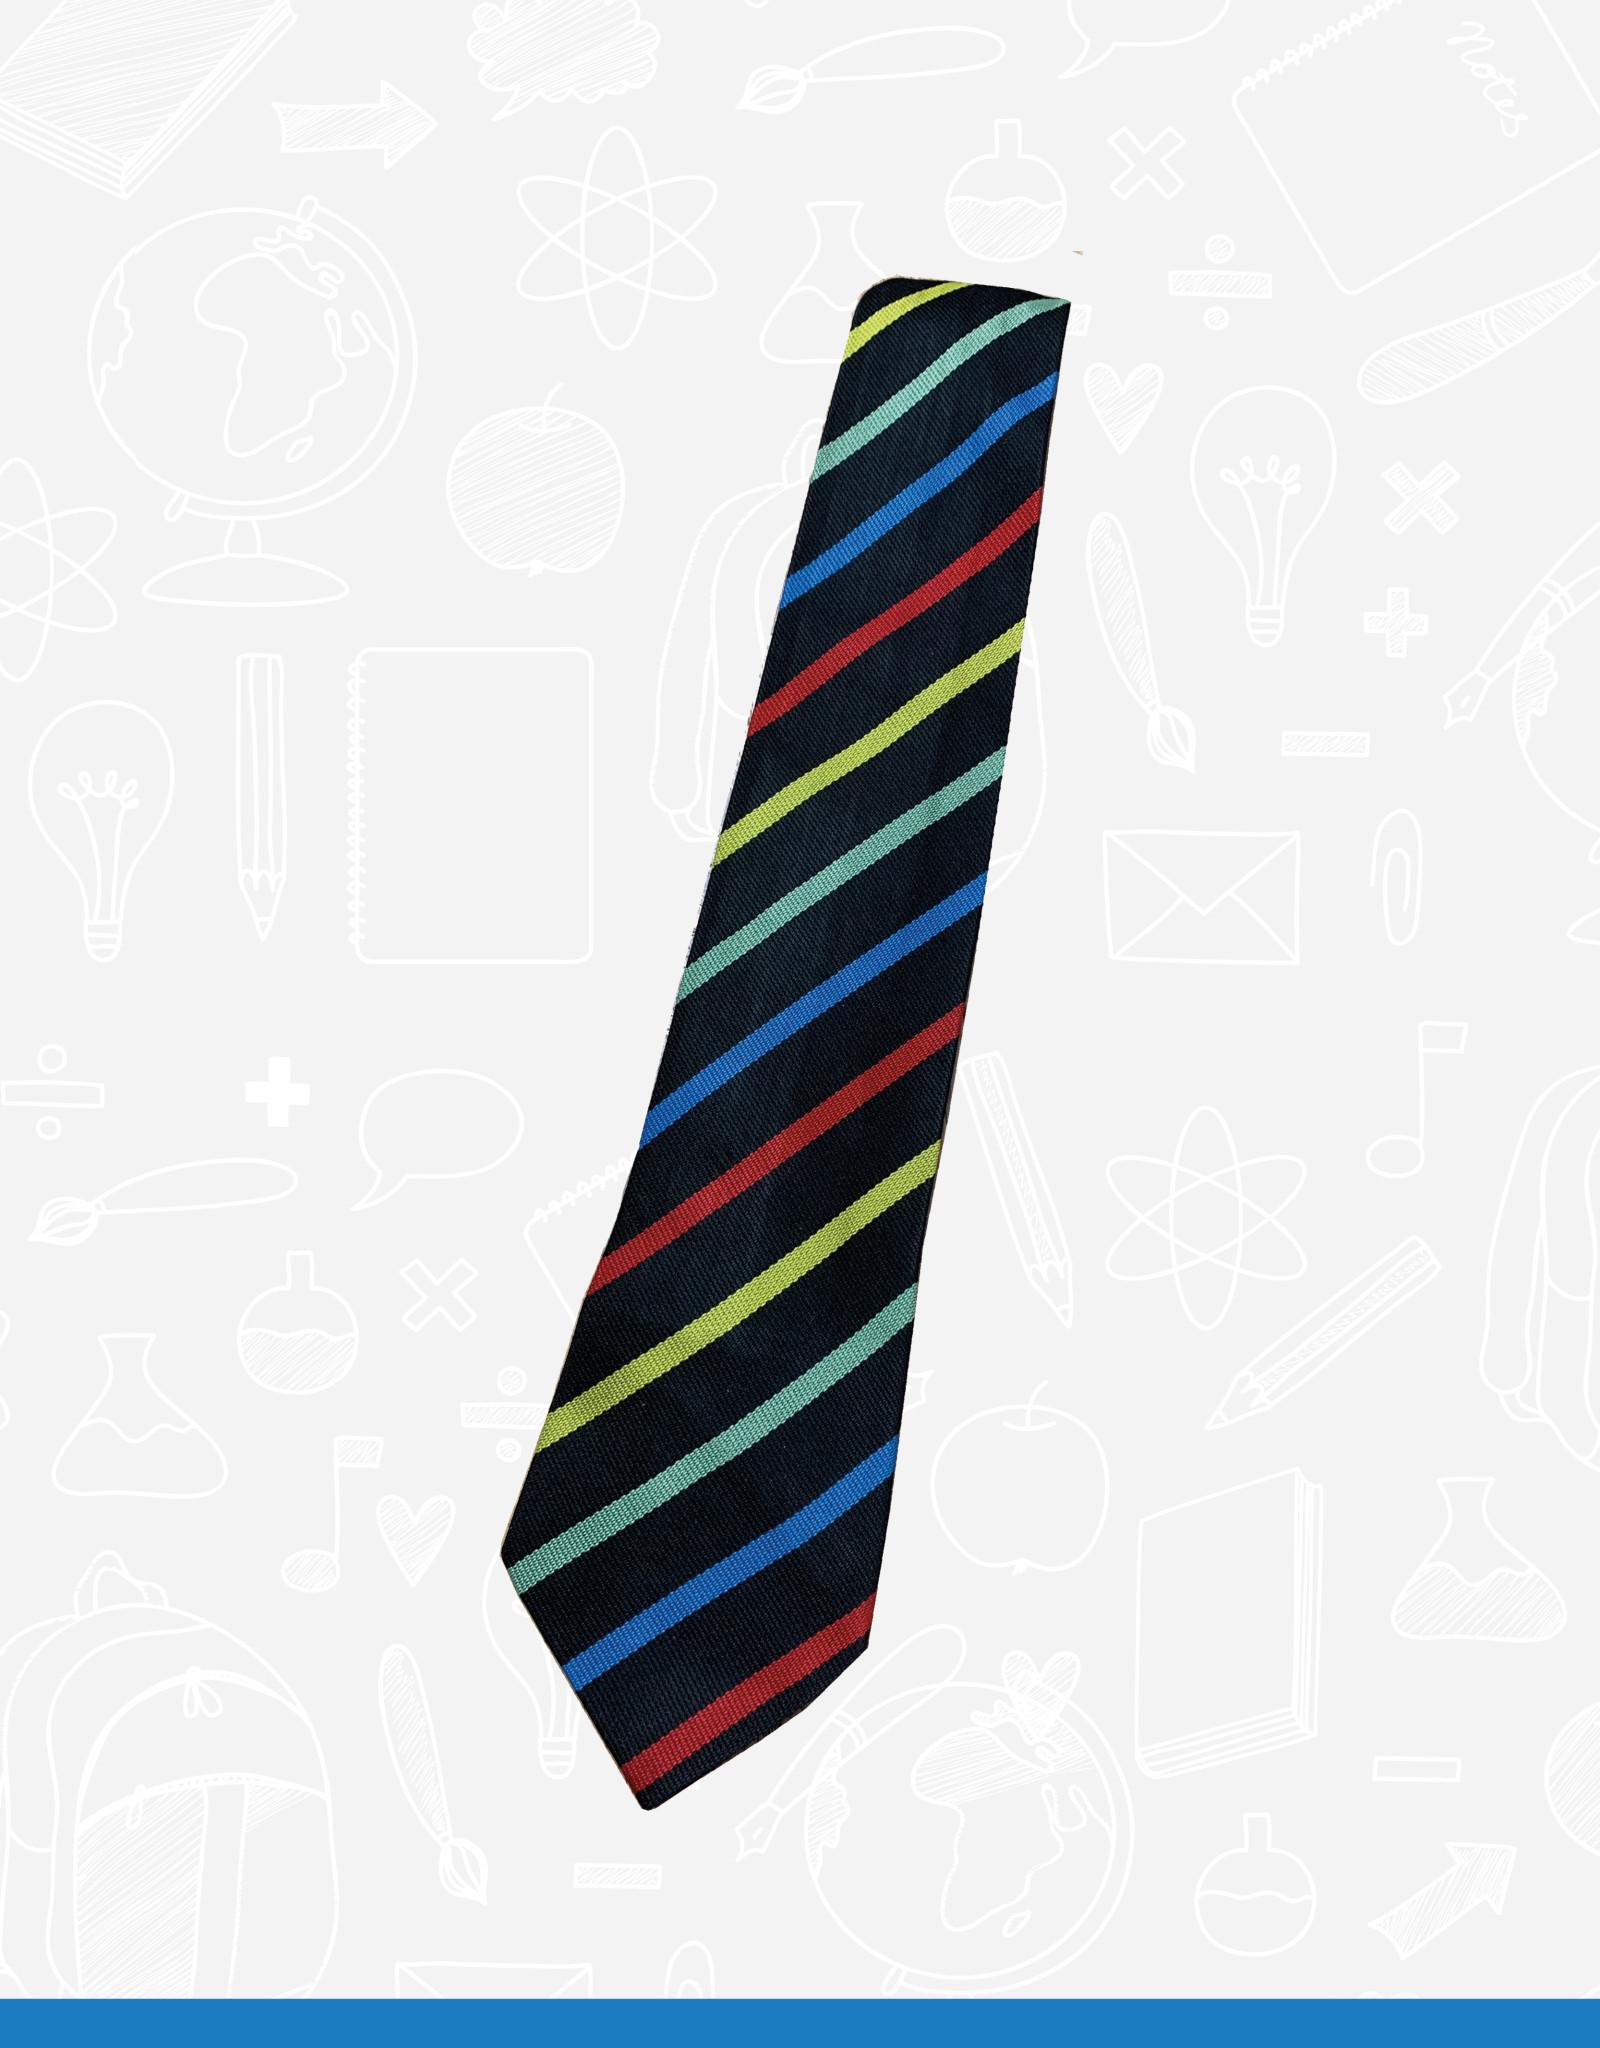 TSW Ties Bloomfield Primary Tie (6845)